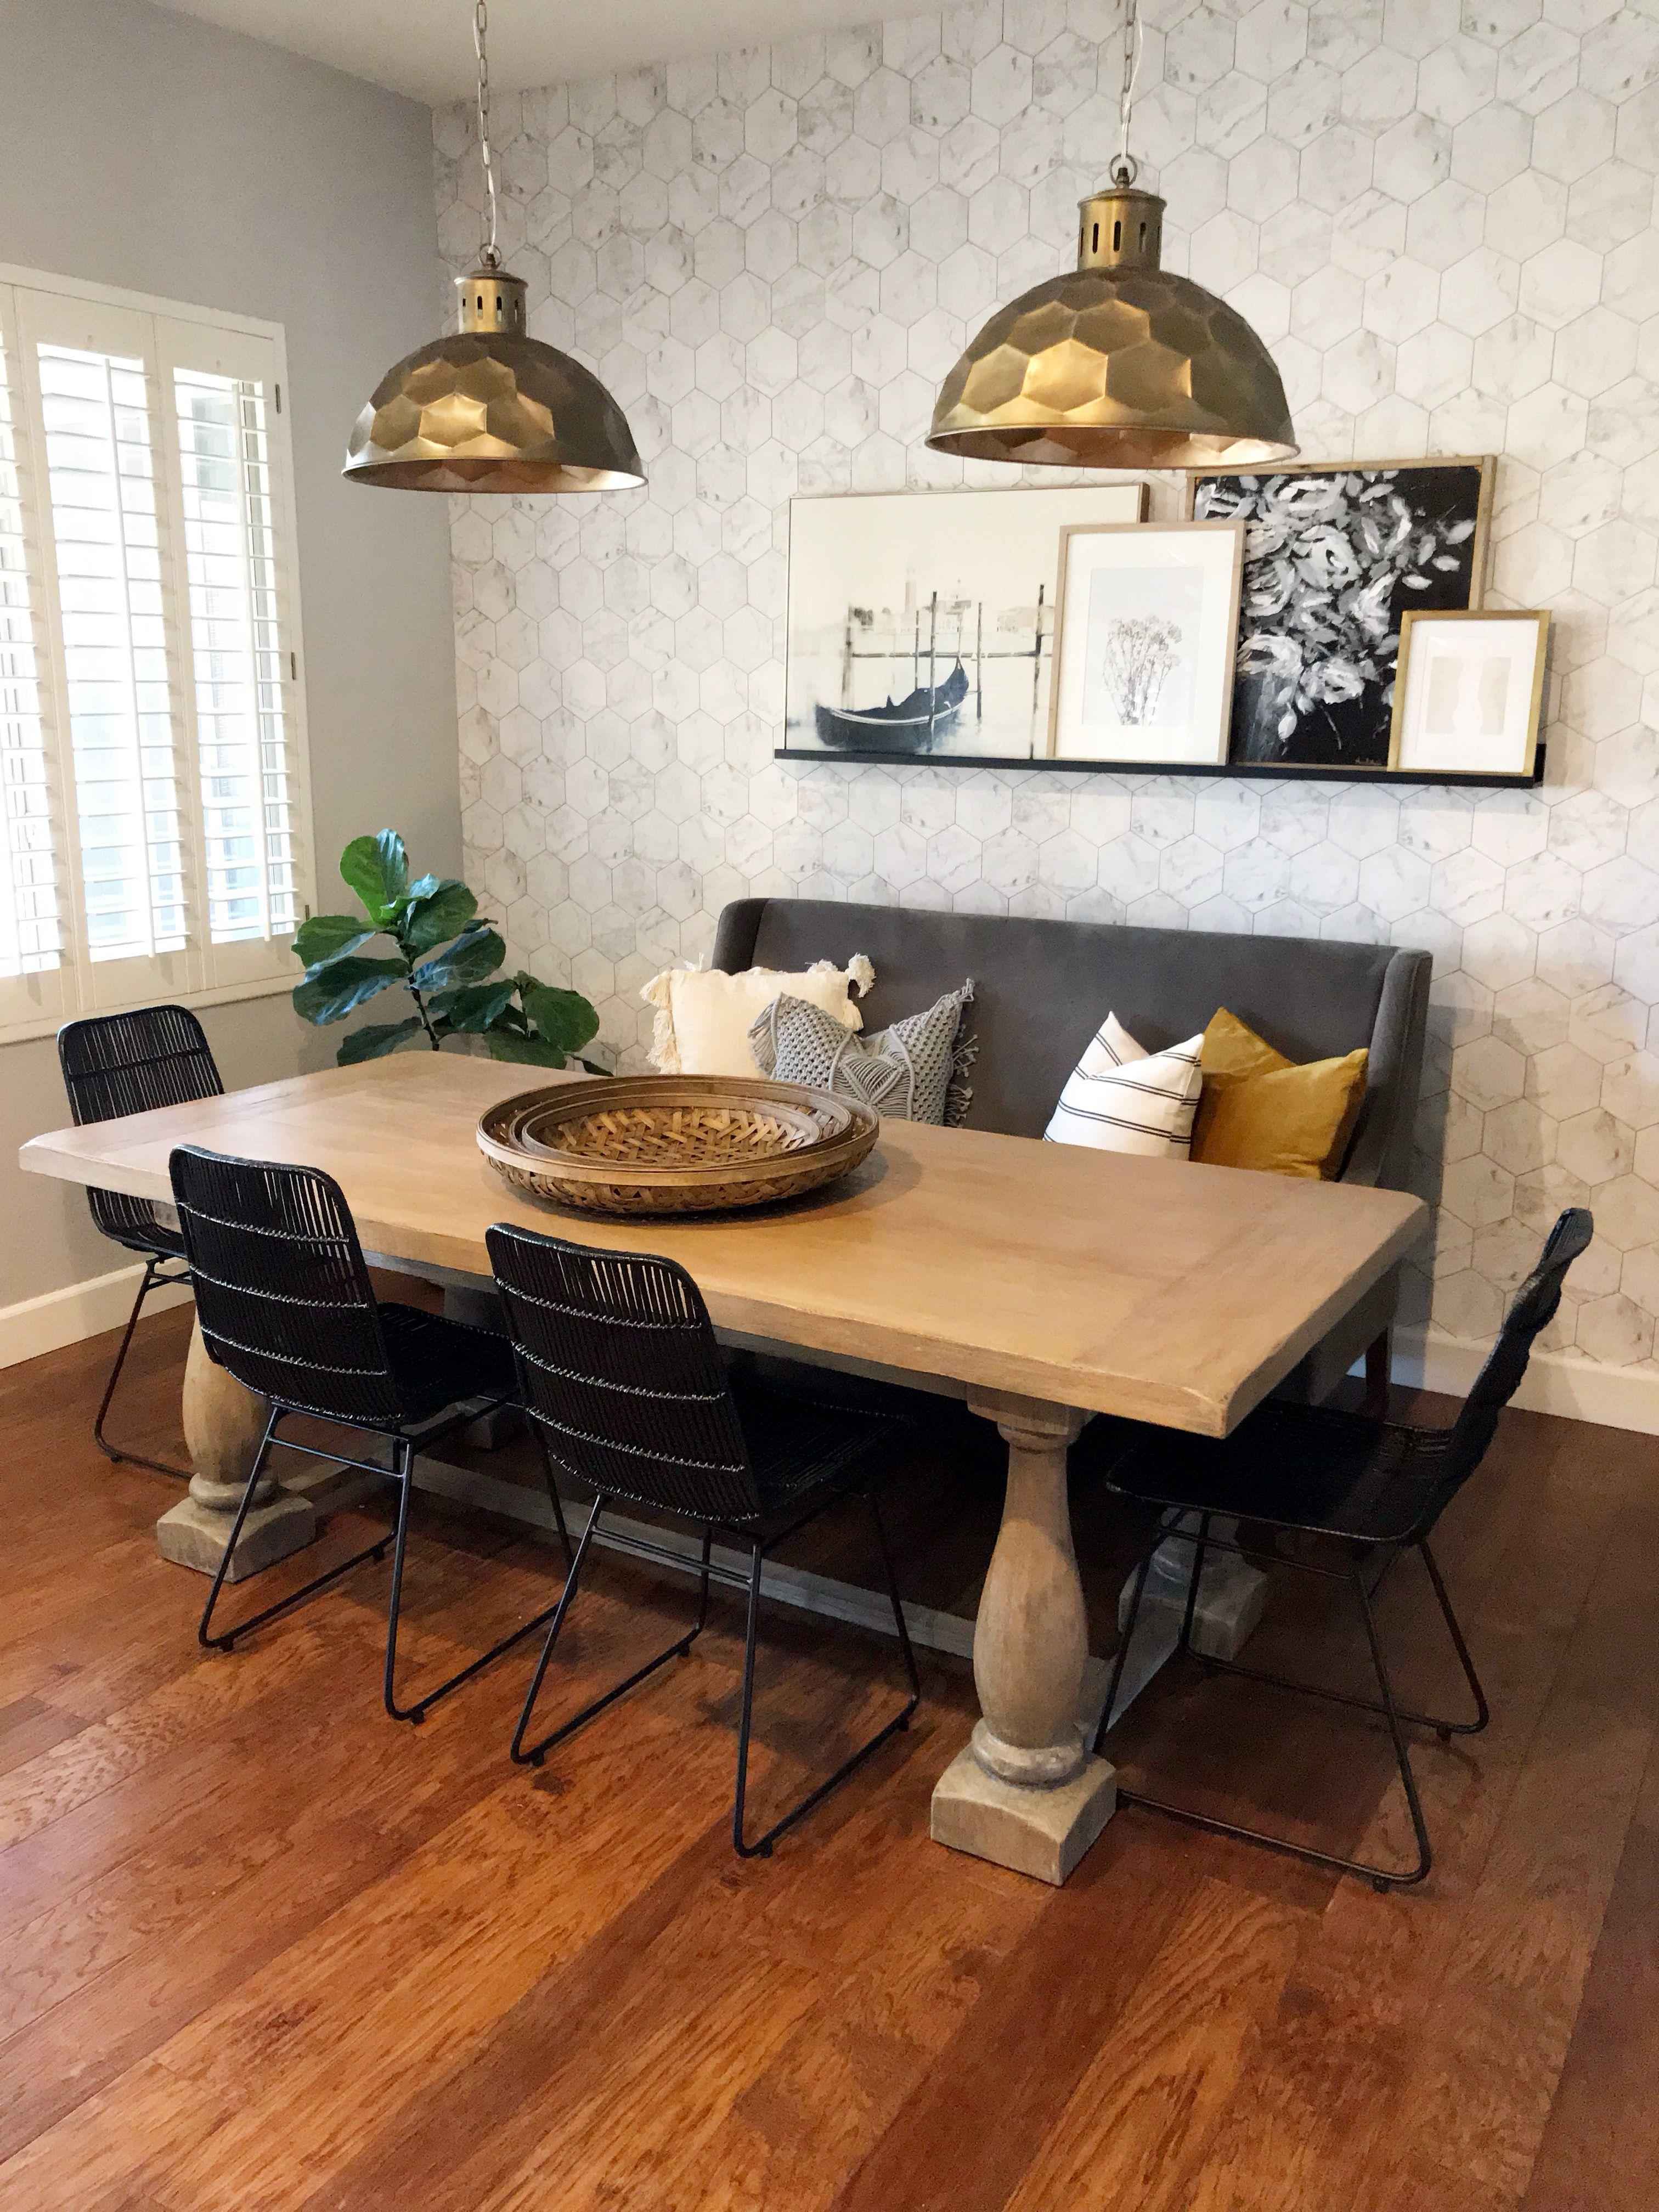 Marble & Copper Tiles wallpaper • Dining Room Wallpaper • Milton & King USA